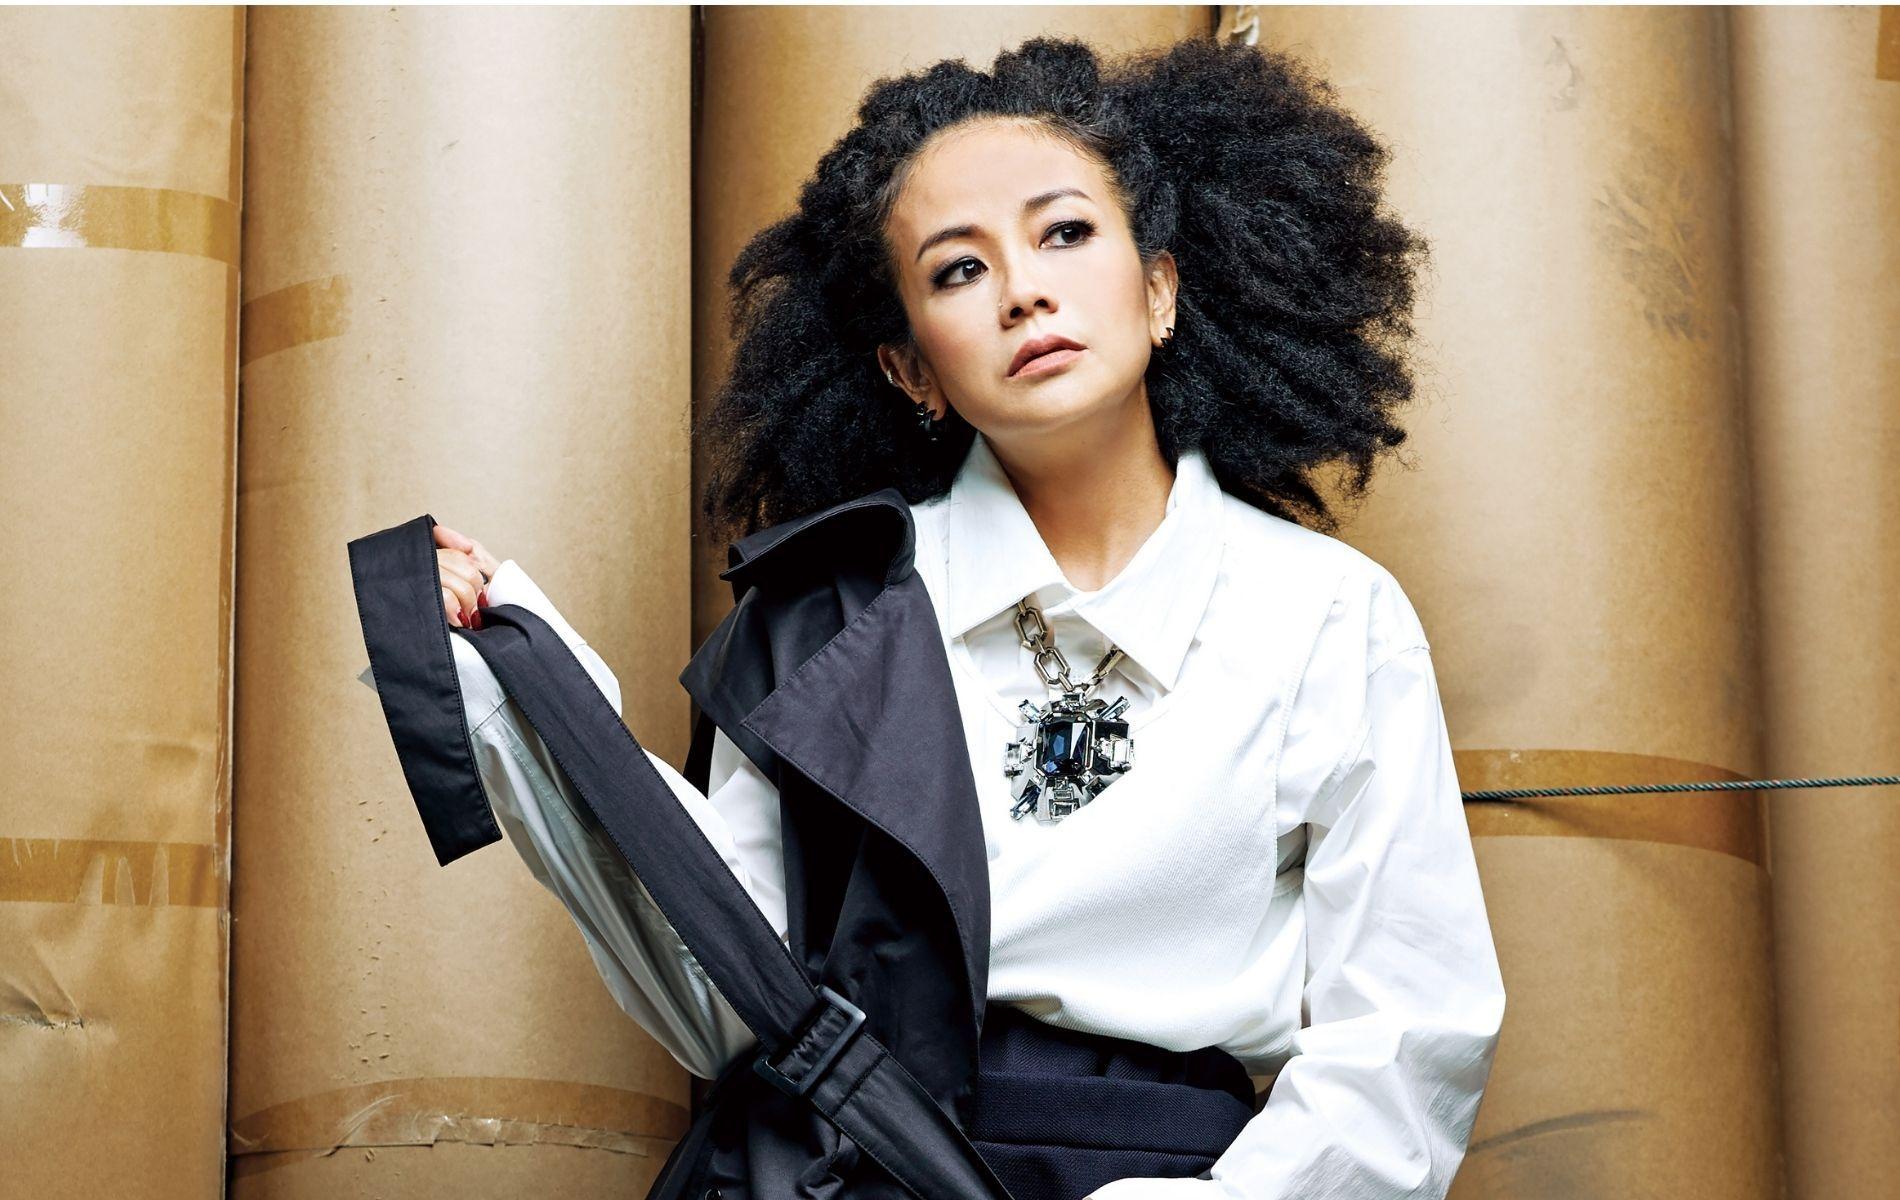 Watch: Tatler Talks With Malaysian Fashion Designer Melinda Looi